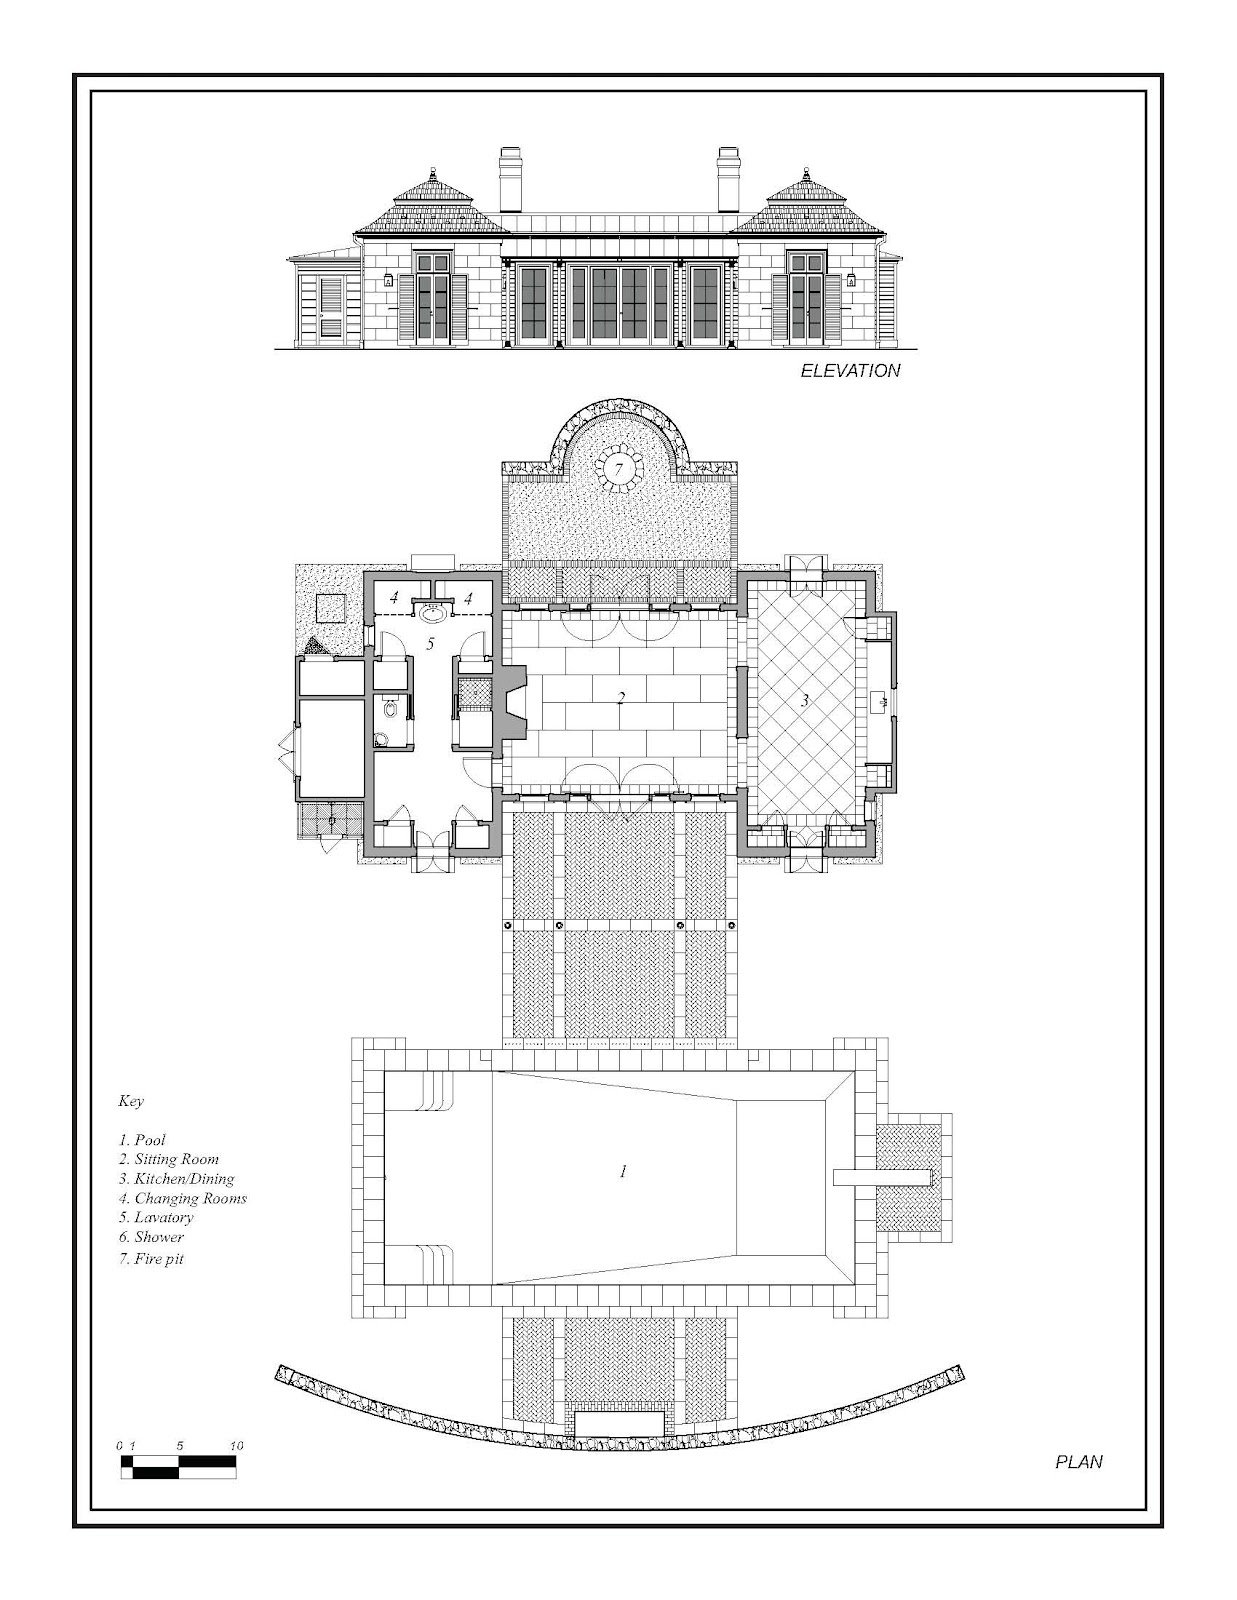 1000 images about floor plans on pinterest vintage for Pool pavilion plans